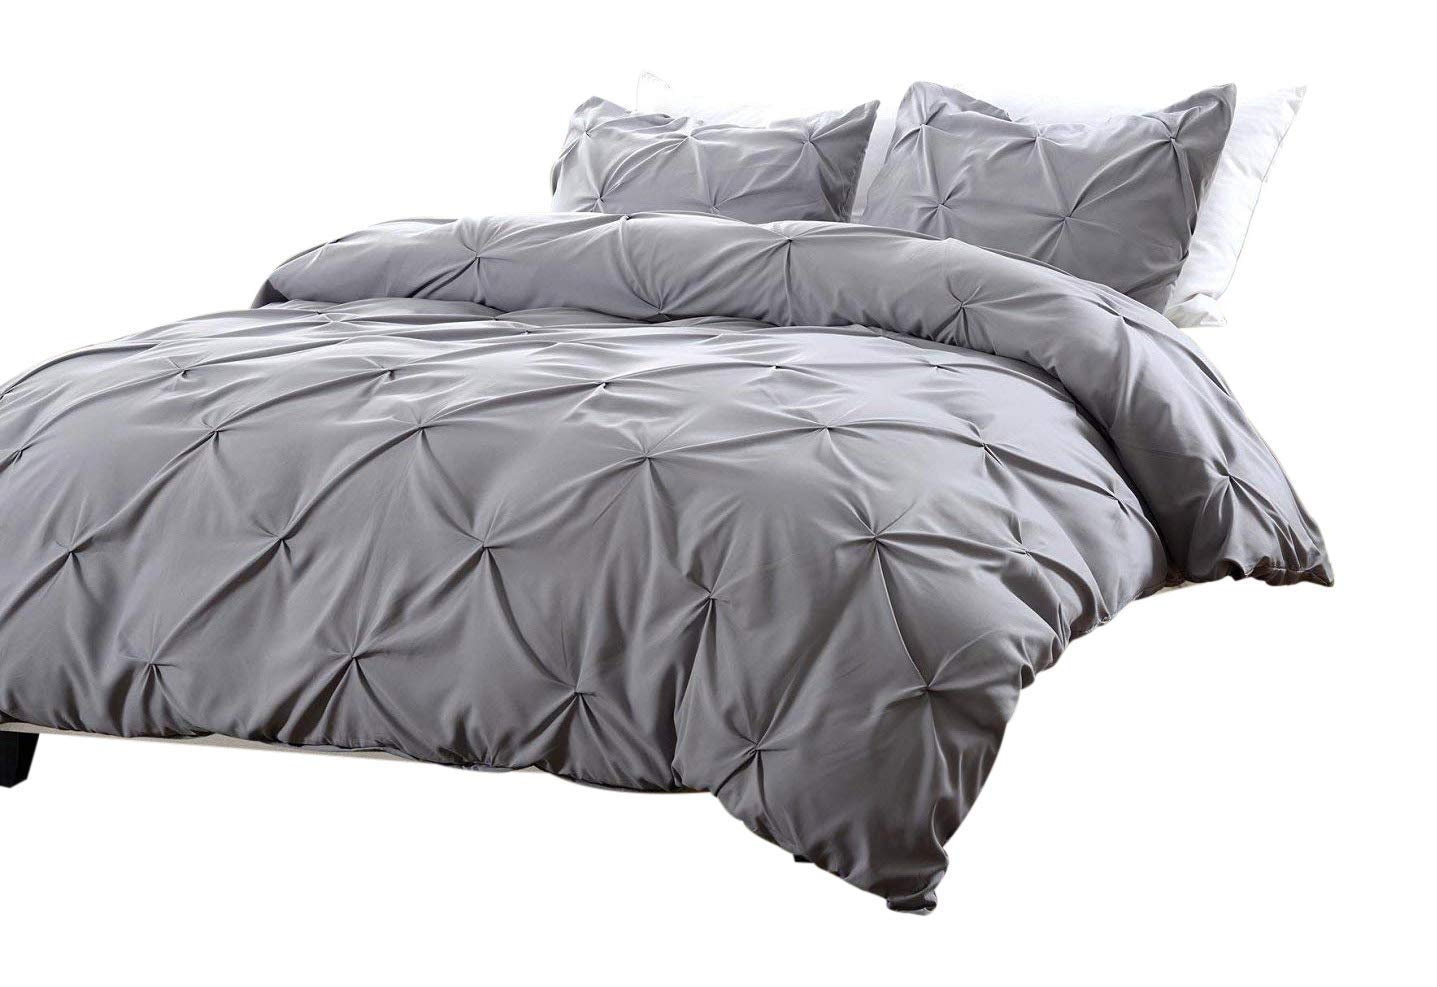 Etonnant Get Quotations · Web Linens Inc Oversized For Pillow Top 3pc Pinch Pleat  Design Gray Duvet Cover Set Style